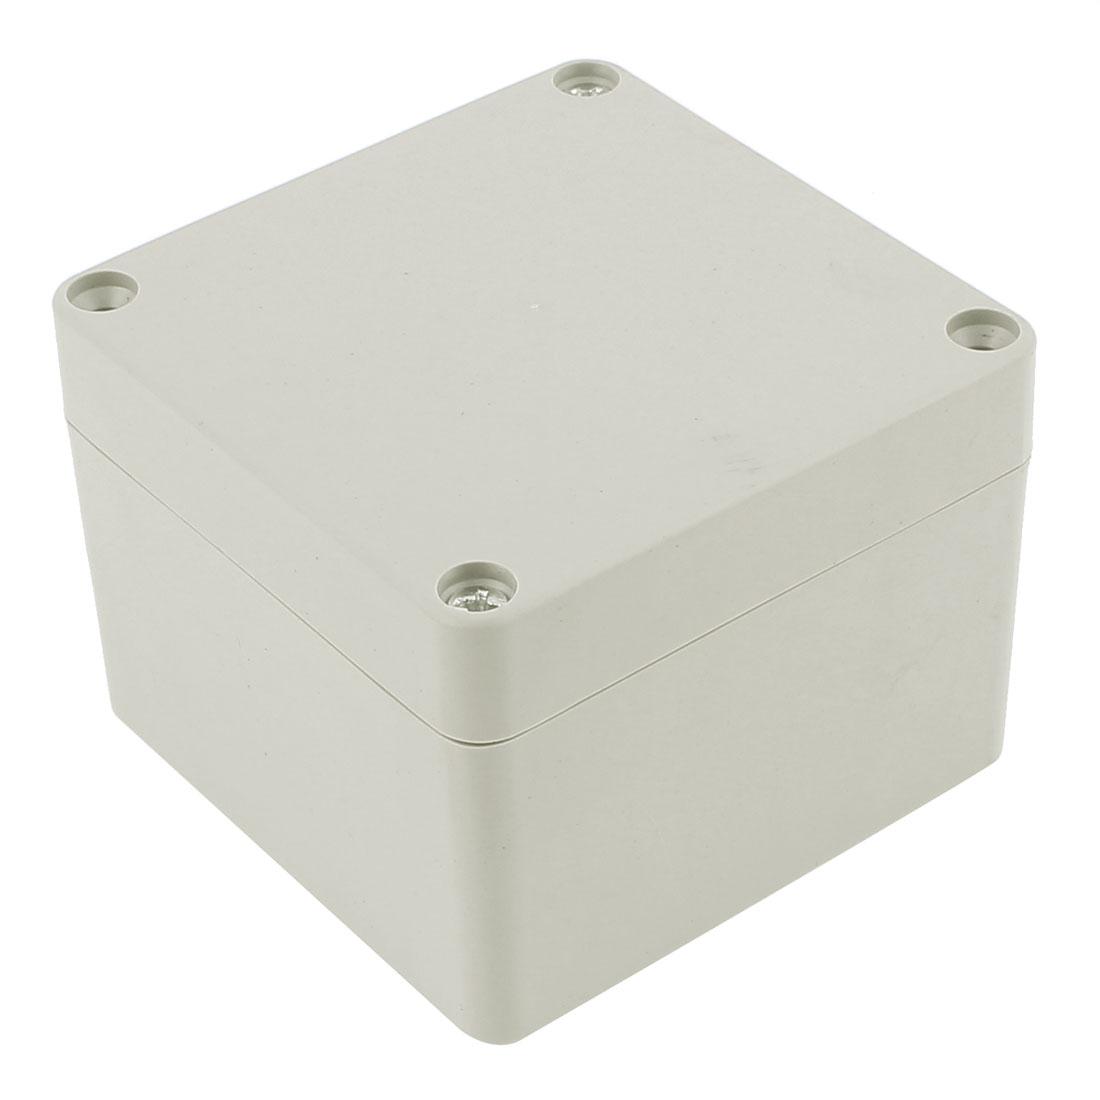 79 x 79 x 60mm Dustproof IP65 Junction Box Terminal Connecting Box Enclosure